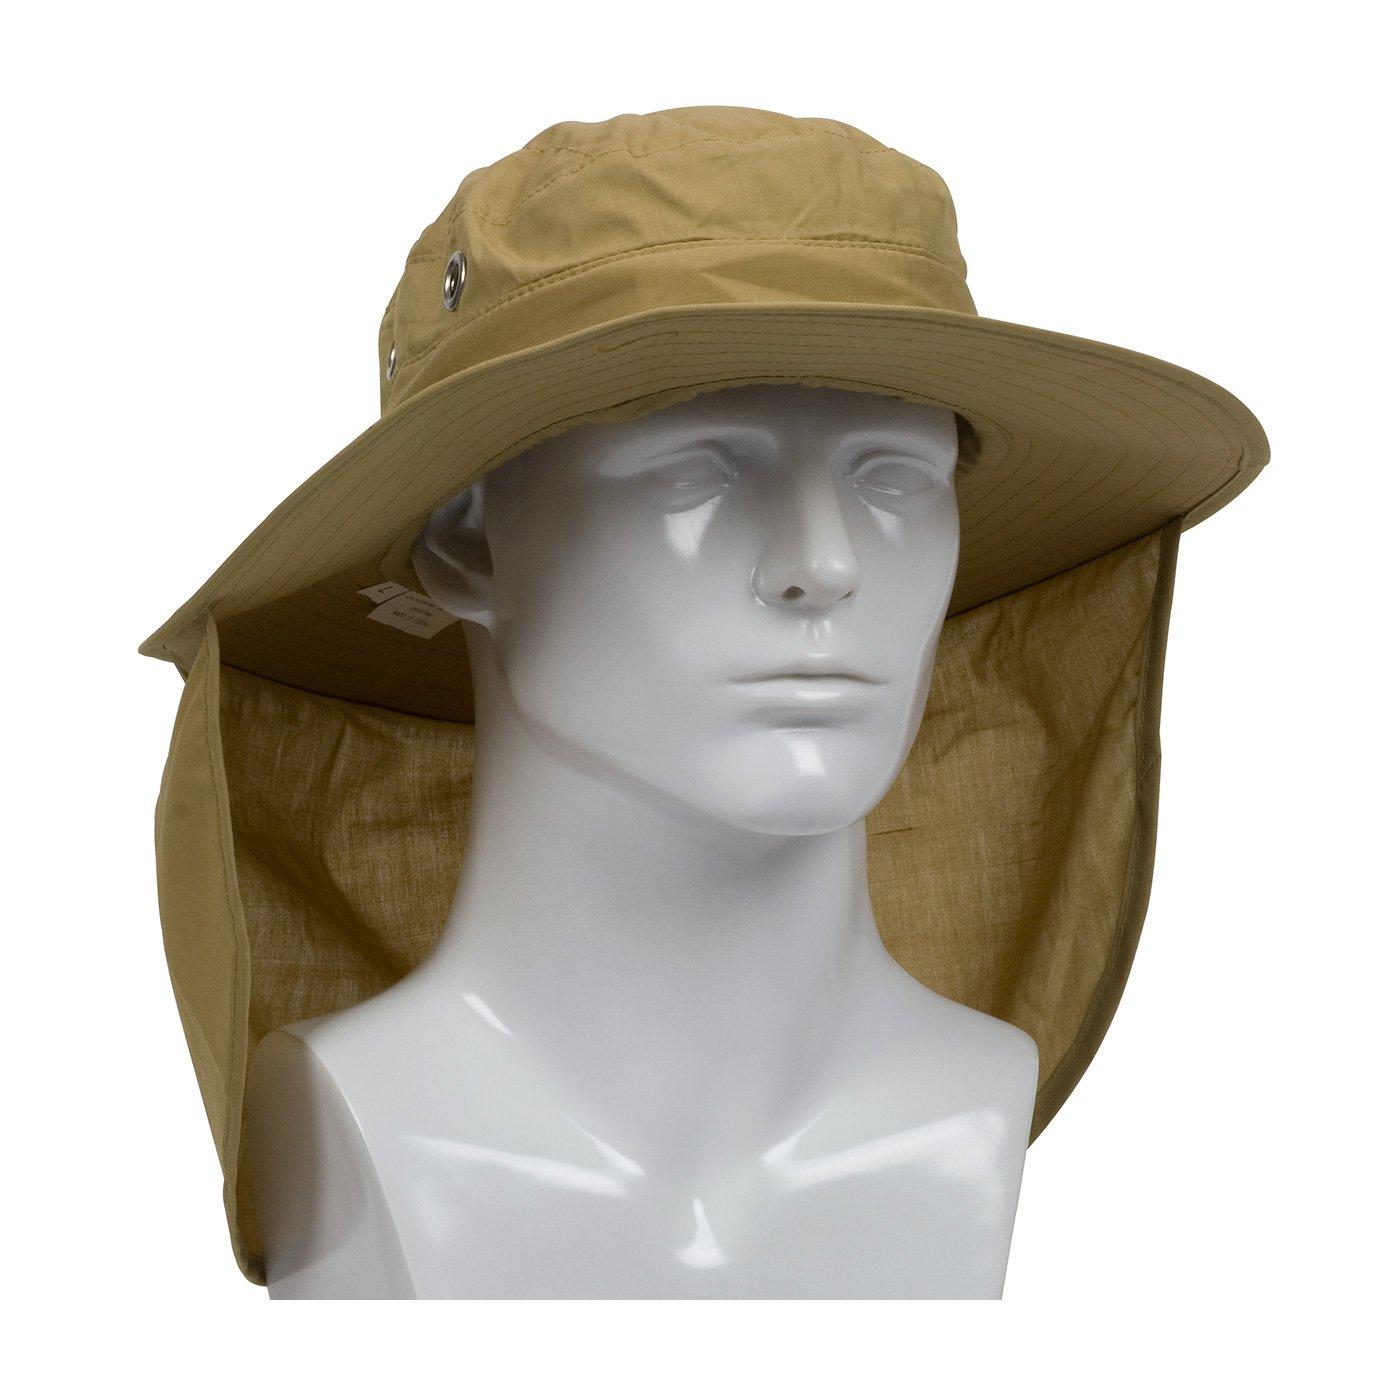 PIP Protective Industrial Products 396-425-KHK-M PIP 396-425-KHK-M Ranger Hat, Neck Shade, M, Tan